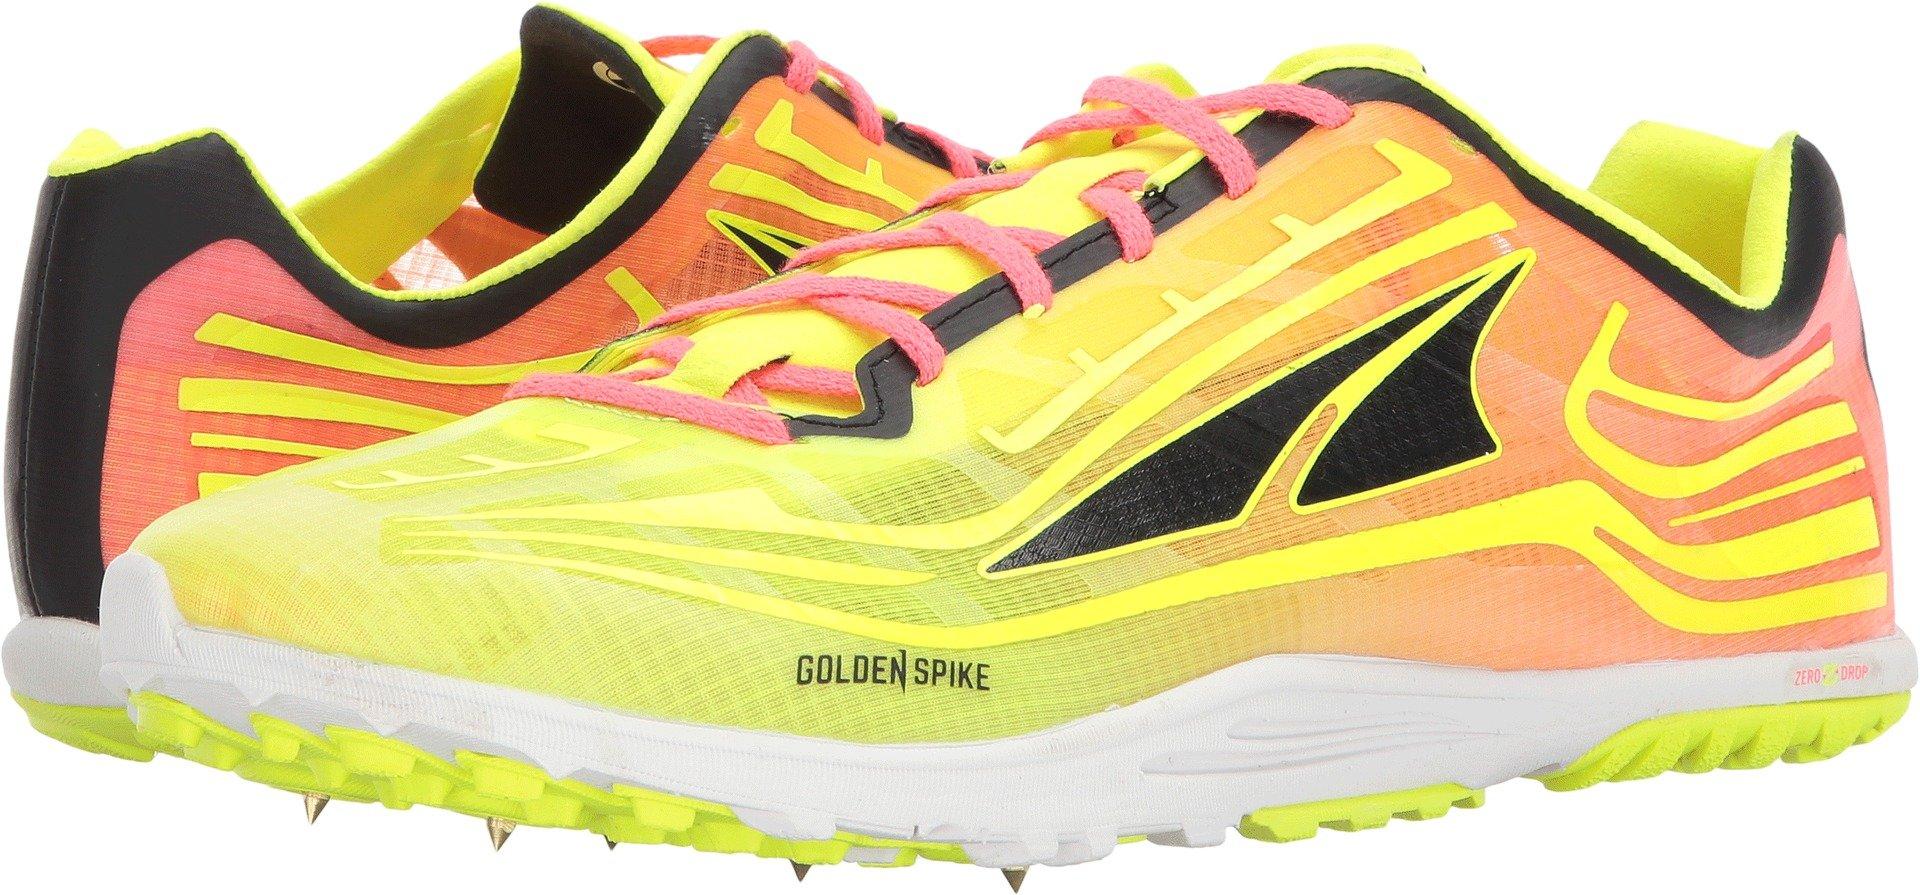 Altra Footwear Unisex Golden Spike Lime/Pink 13.5 Women / 12 Men M US